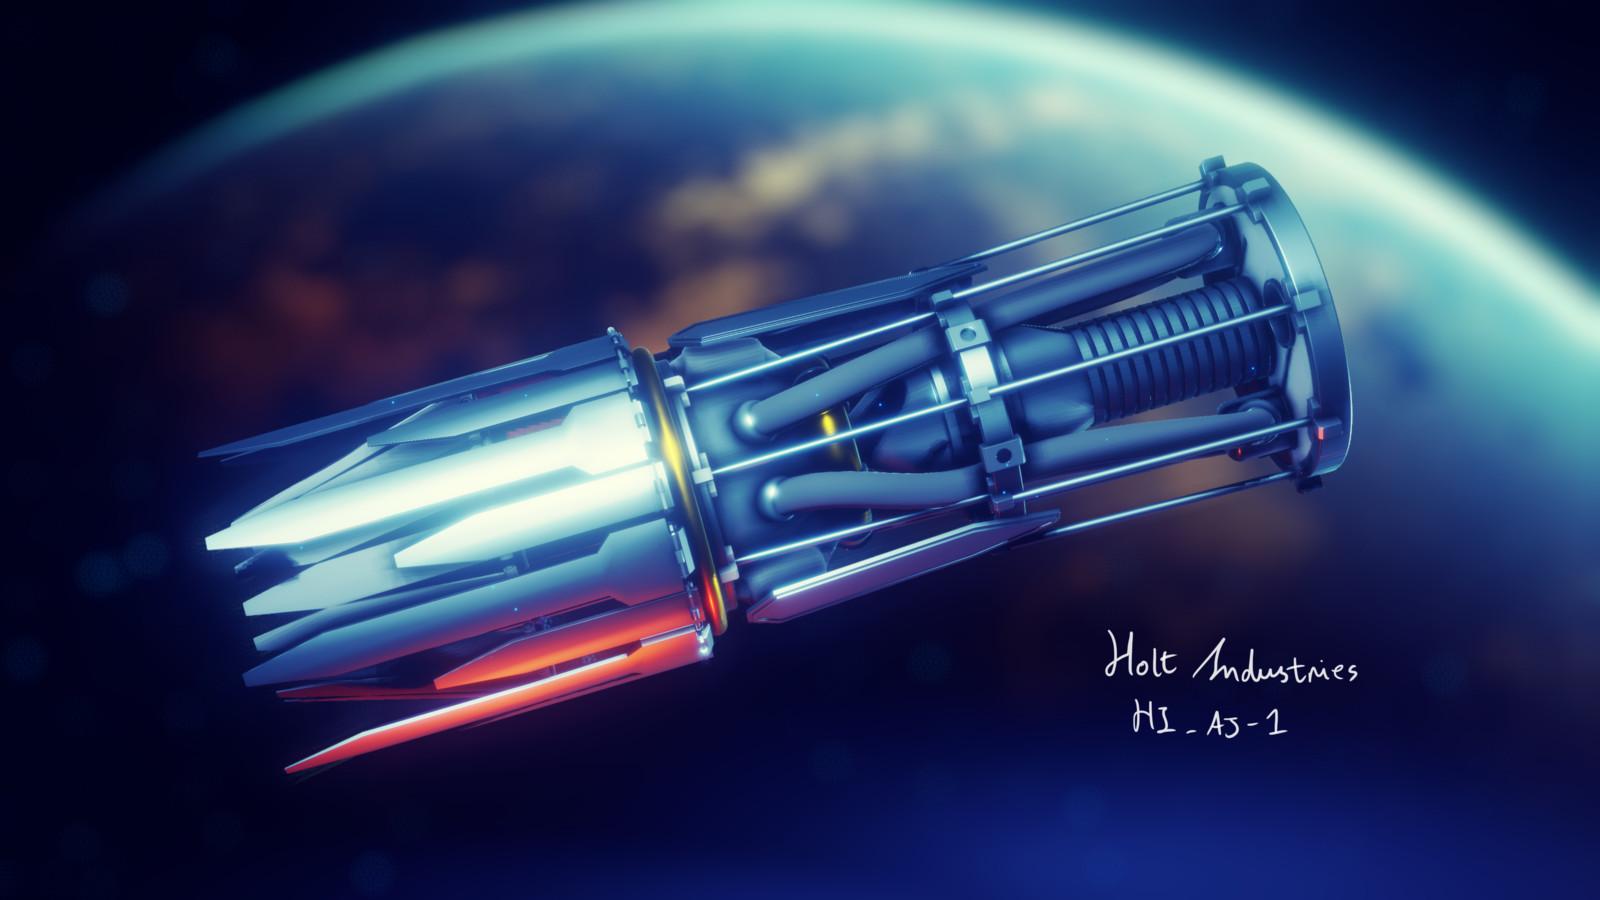 HOLT INDUSTRIES - HI_AJ-1 + HI_MA-1